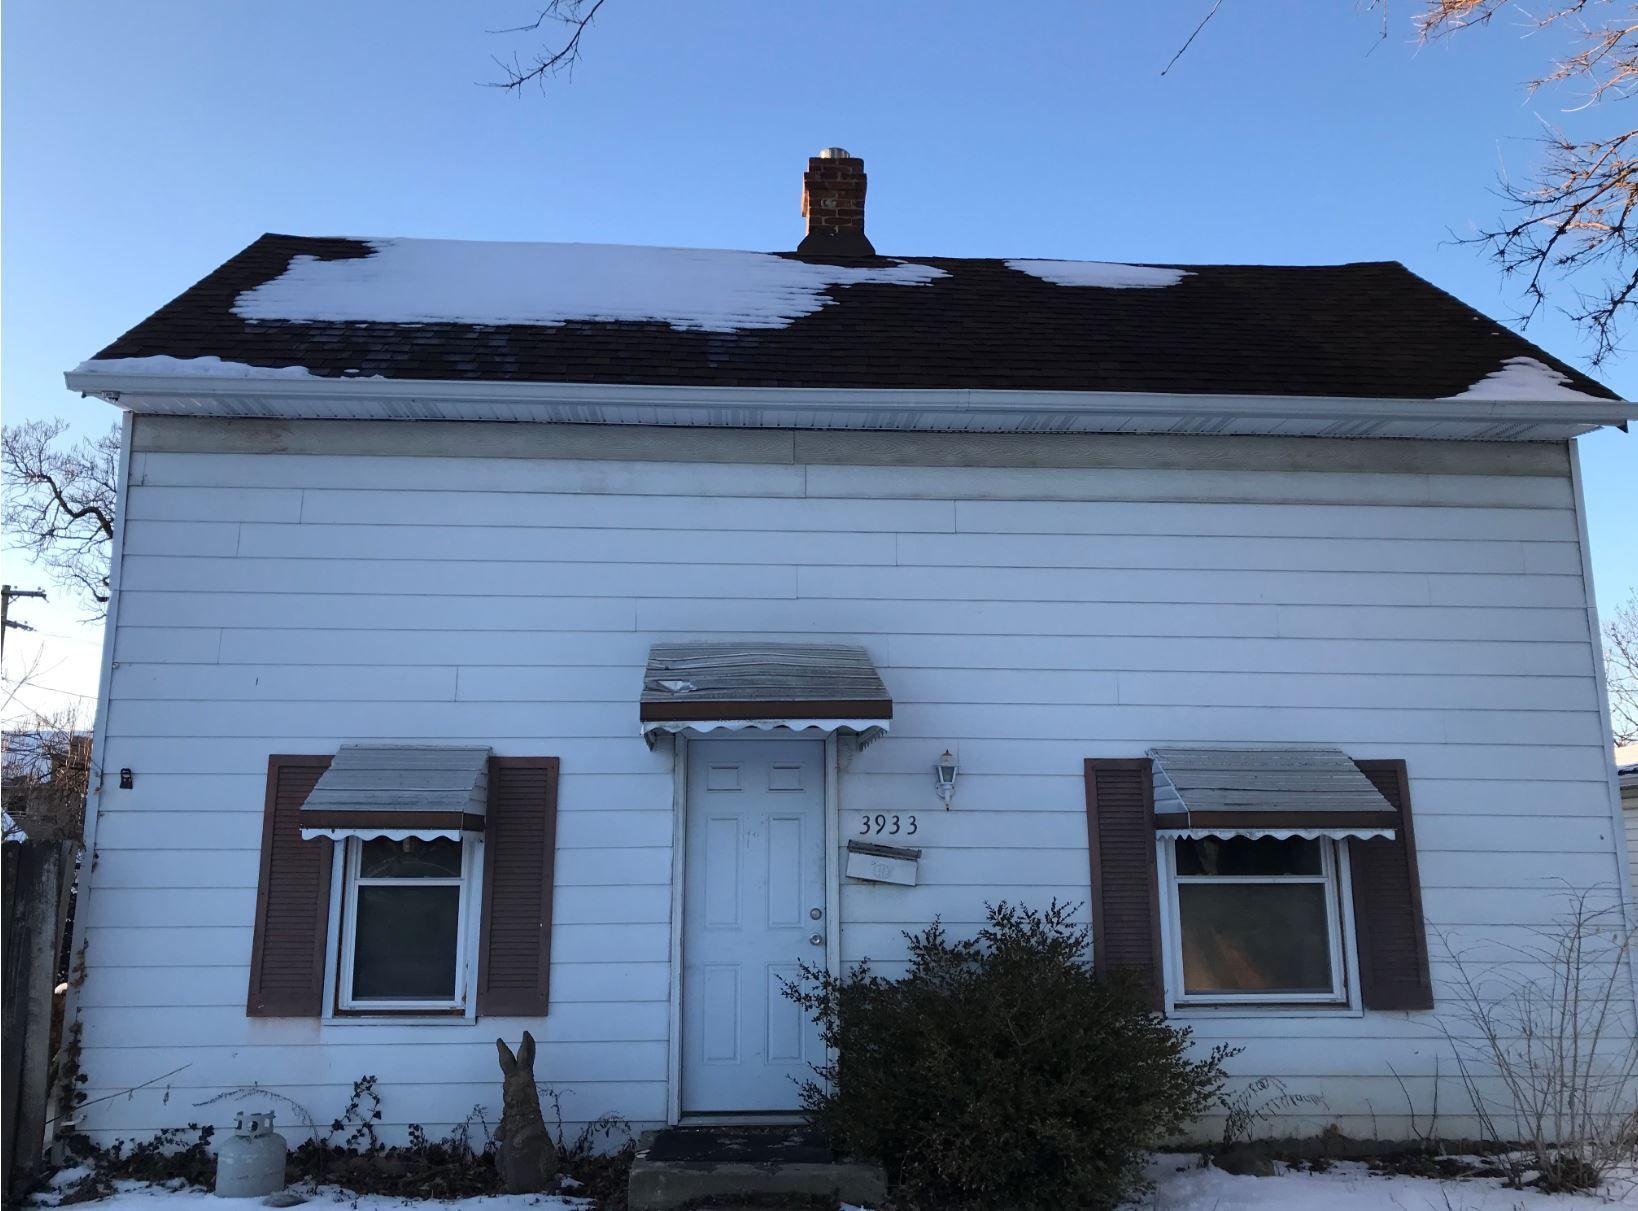 3933 Columbia St, Hilliard, OH